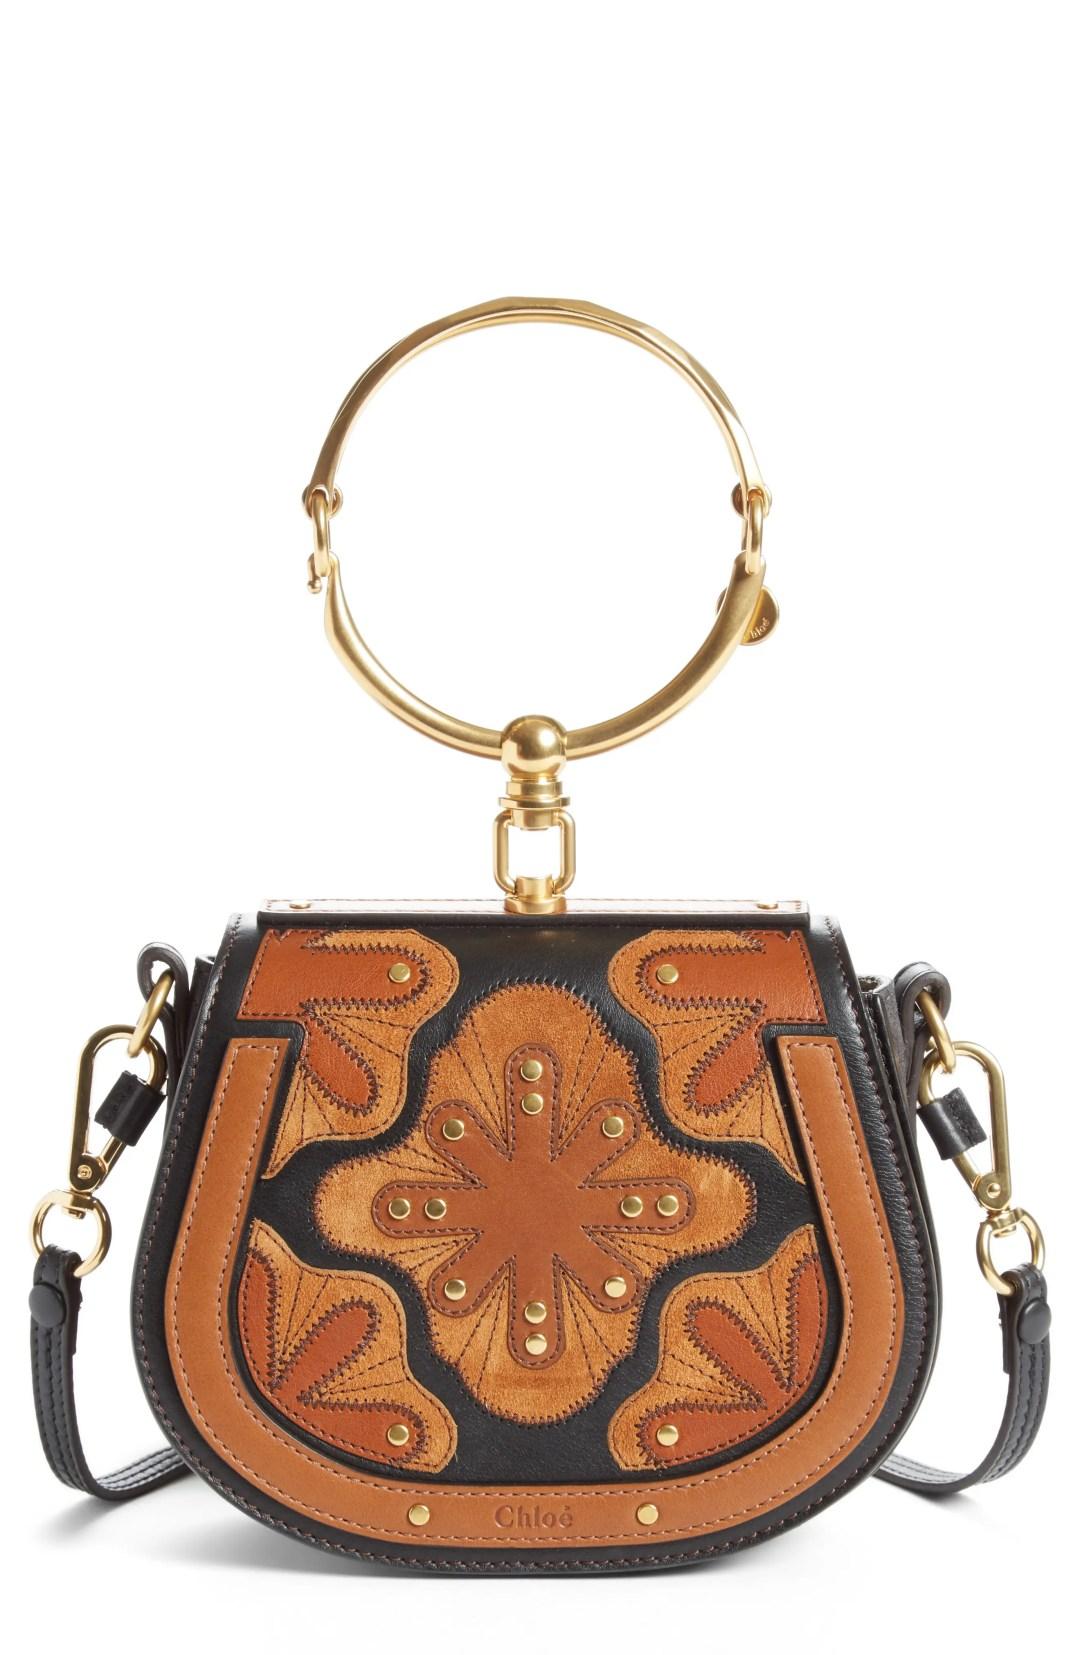 Chloé Small Nile Calfskin Leather Bracelet Bag 5d6d5ec45c